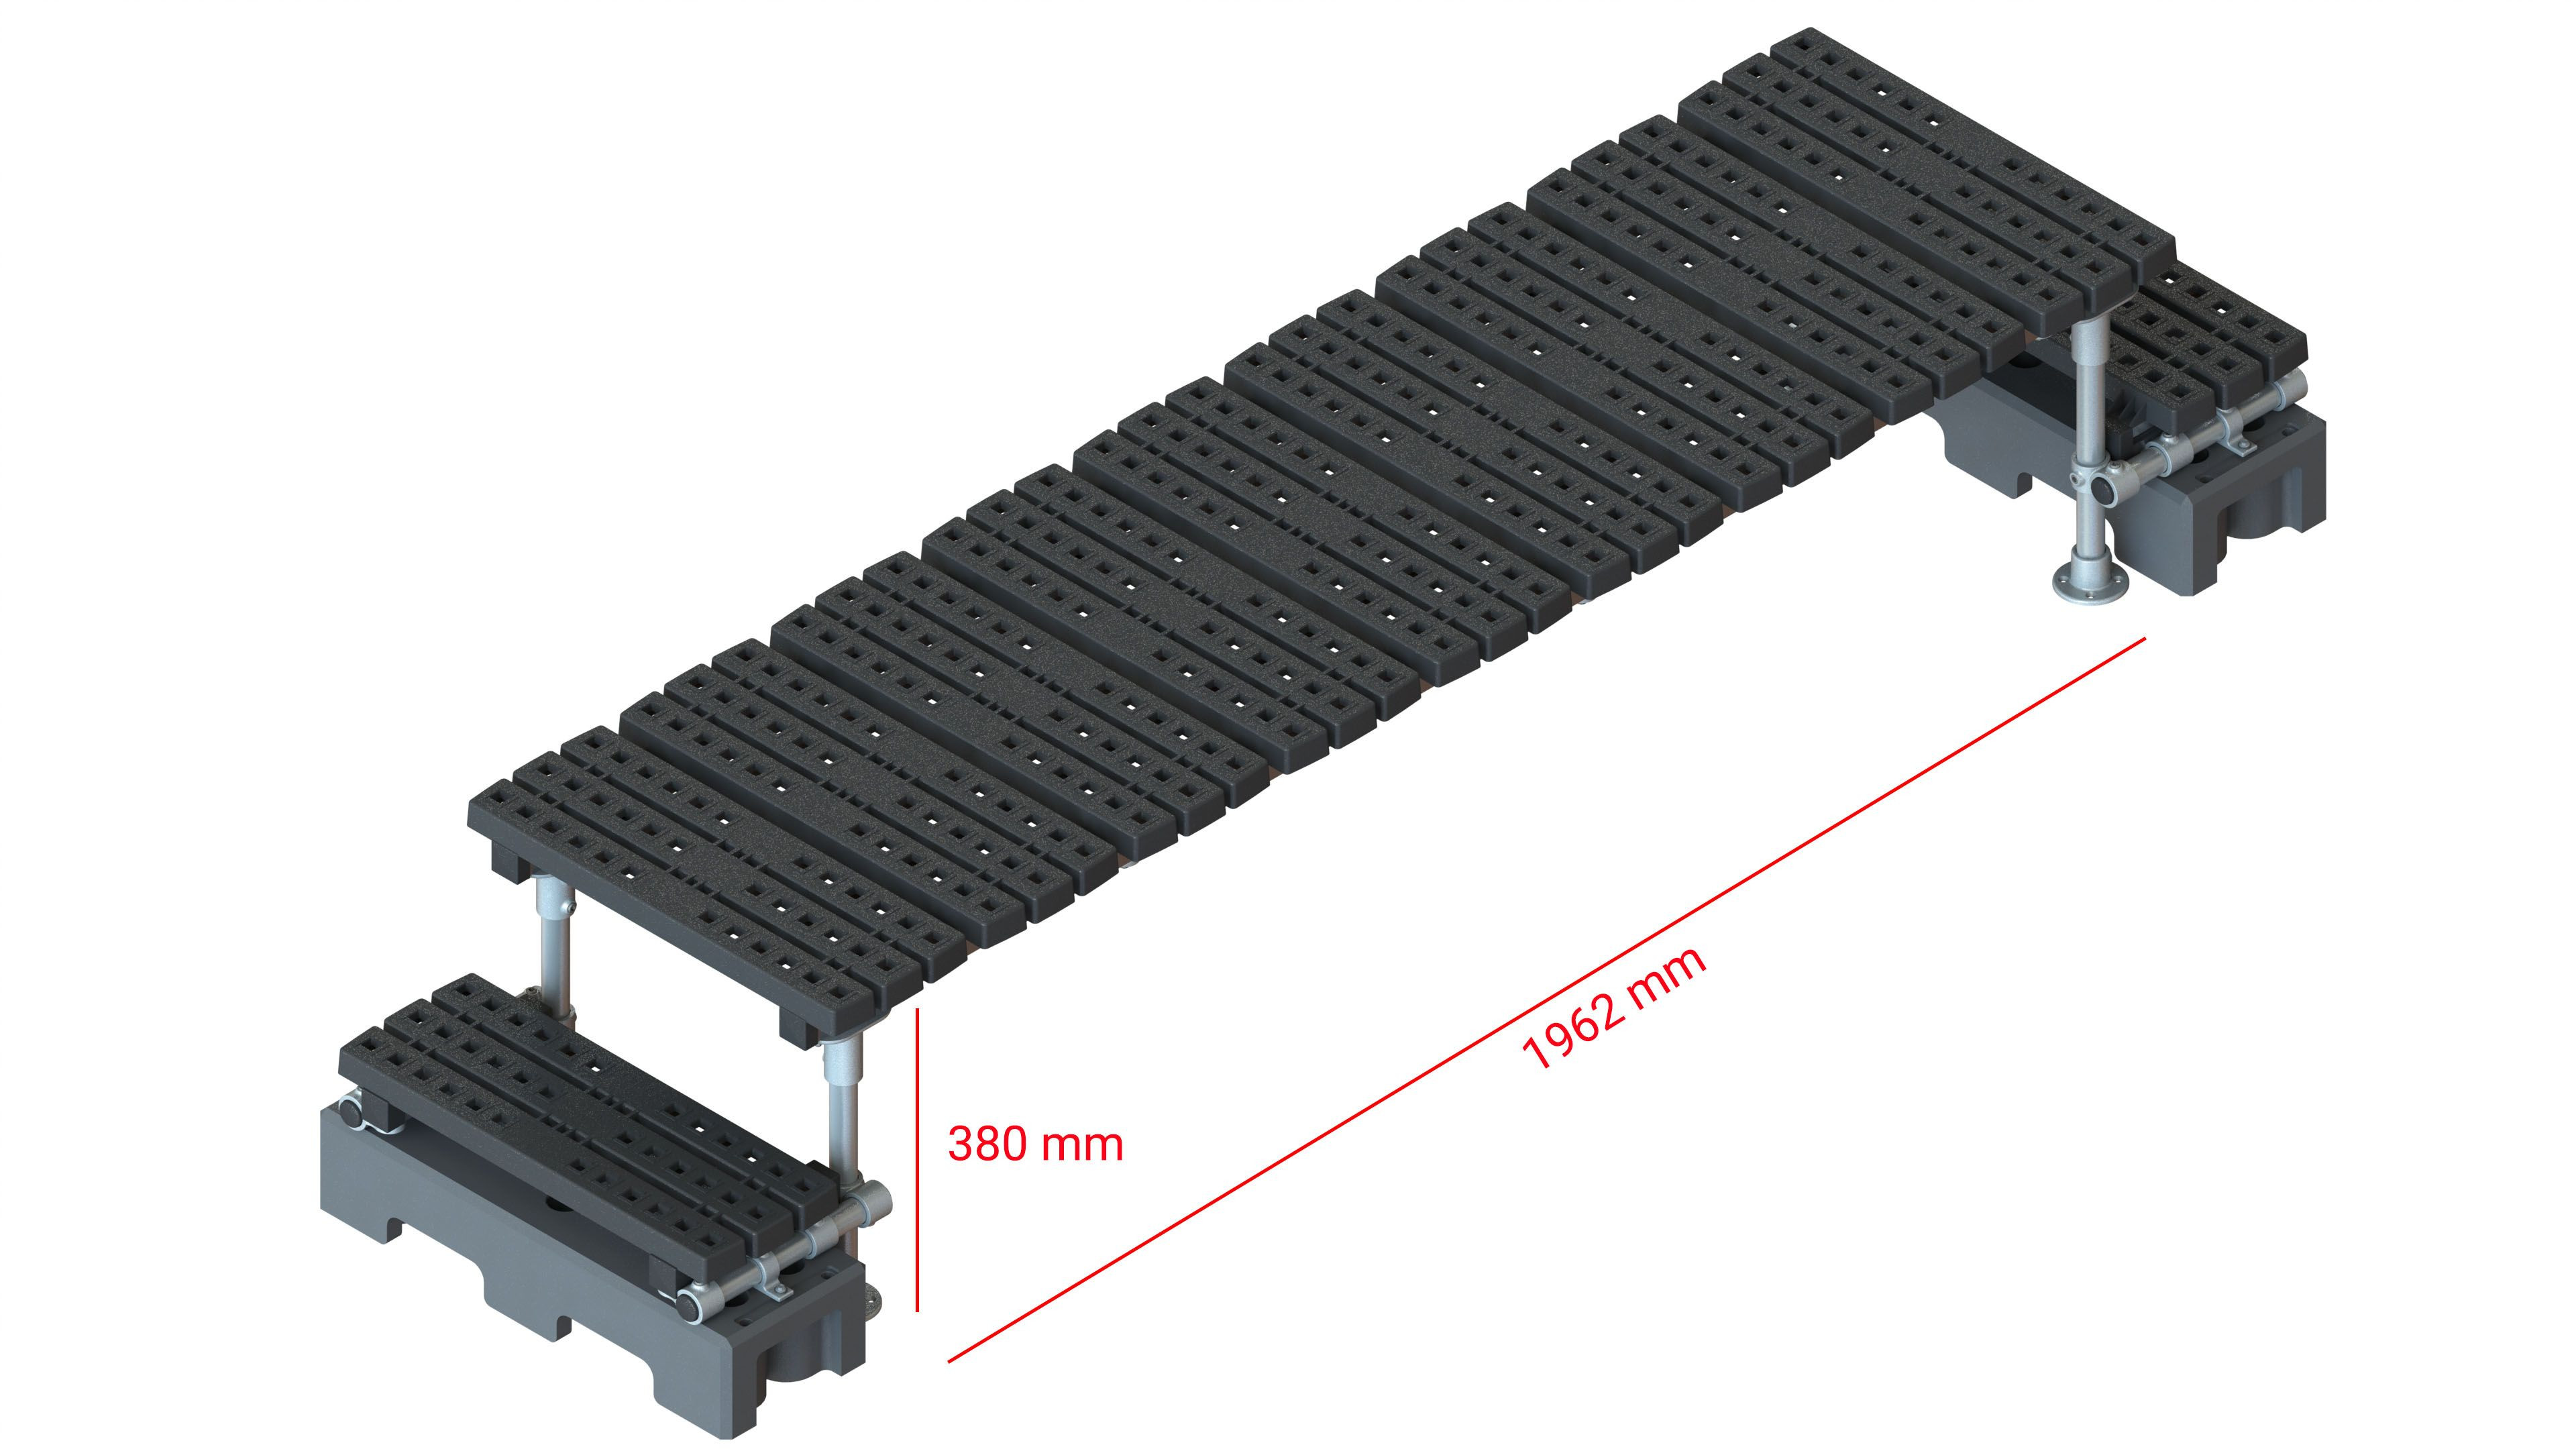 Mini step-over platform - Freestanding, 380x1962mm clearance